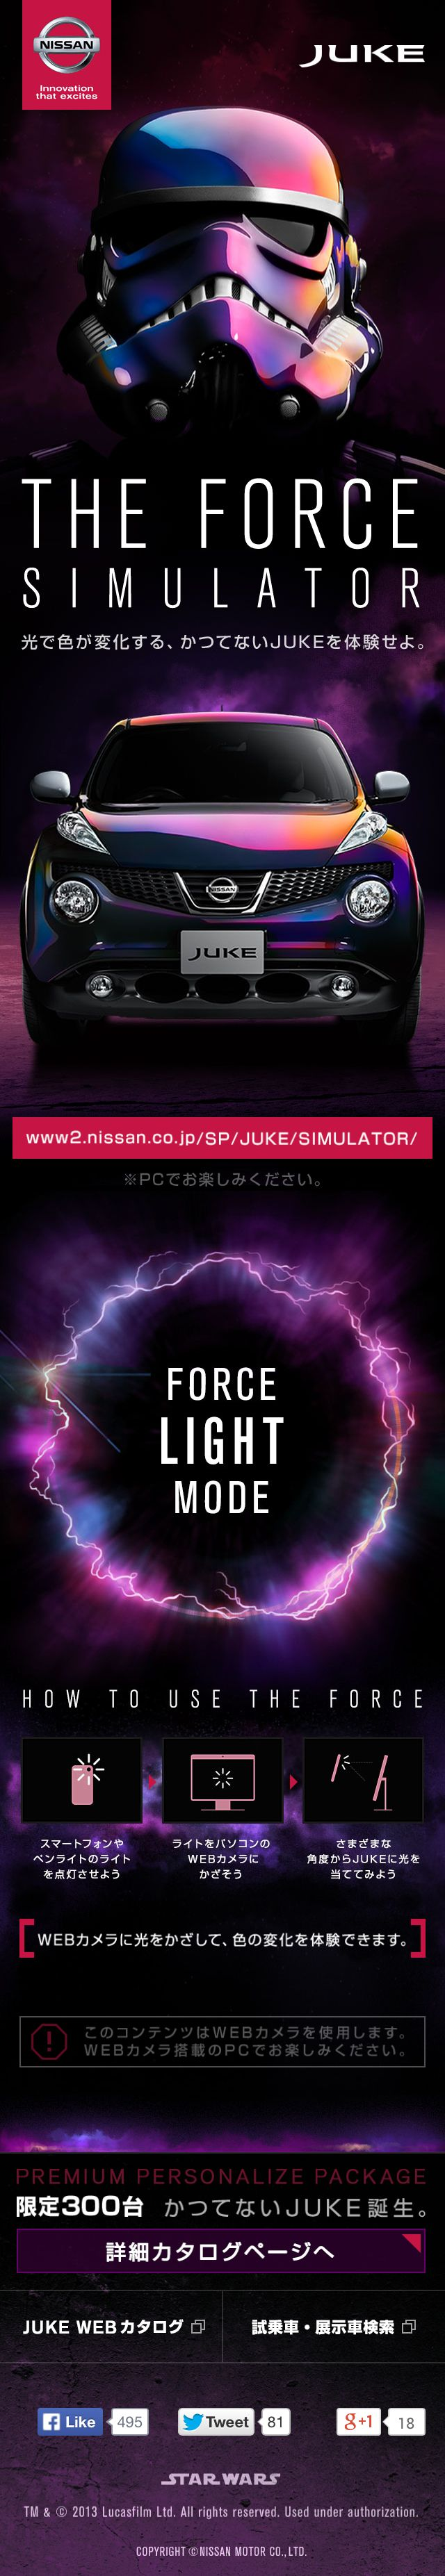 http://k.nissan.co.jp/SP/JUKE/SIMULATOR/page.php?f=SP%2FJUKE%2FSIMULATOR%2Ftop